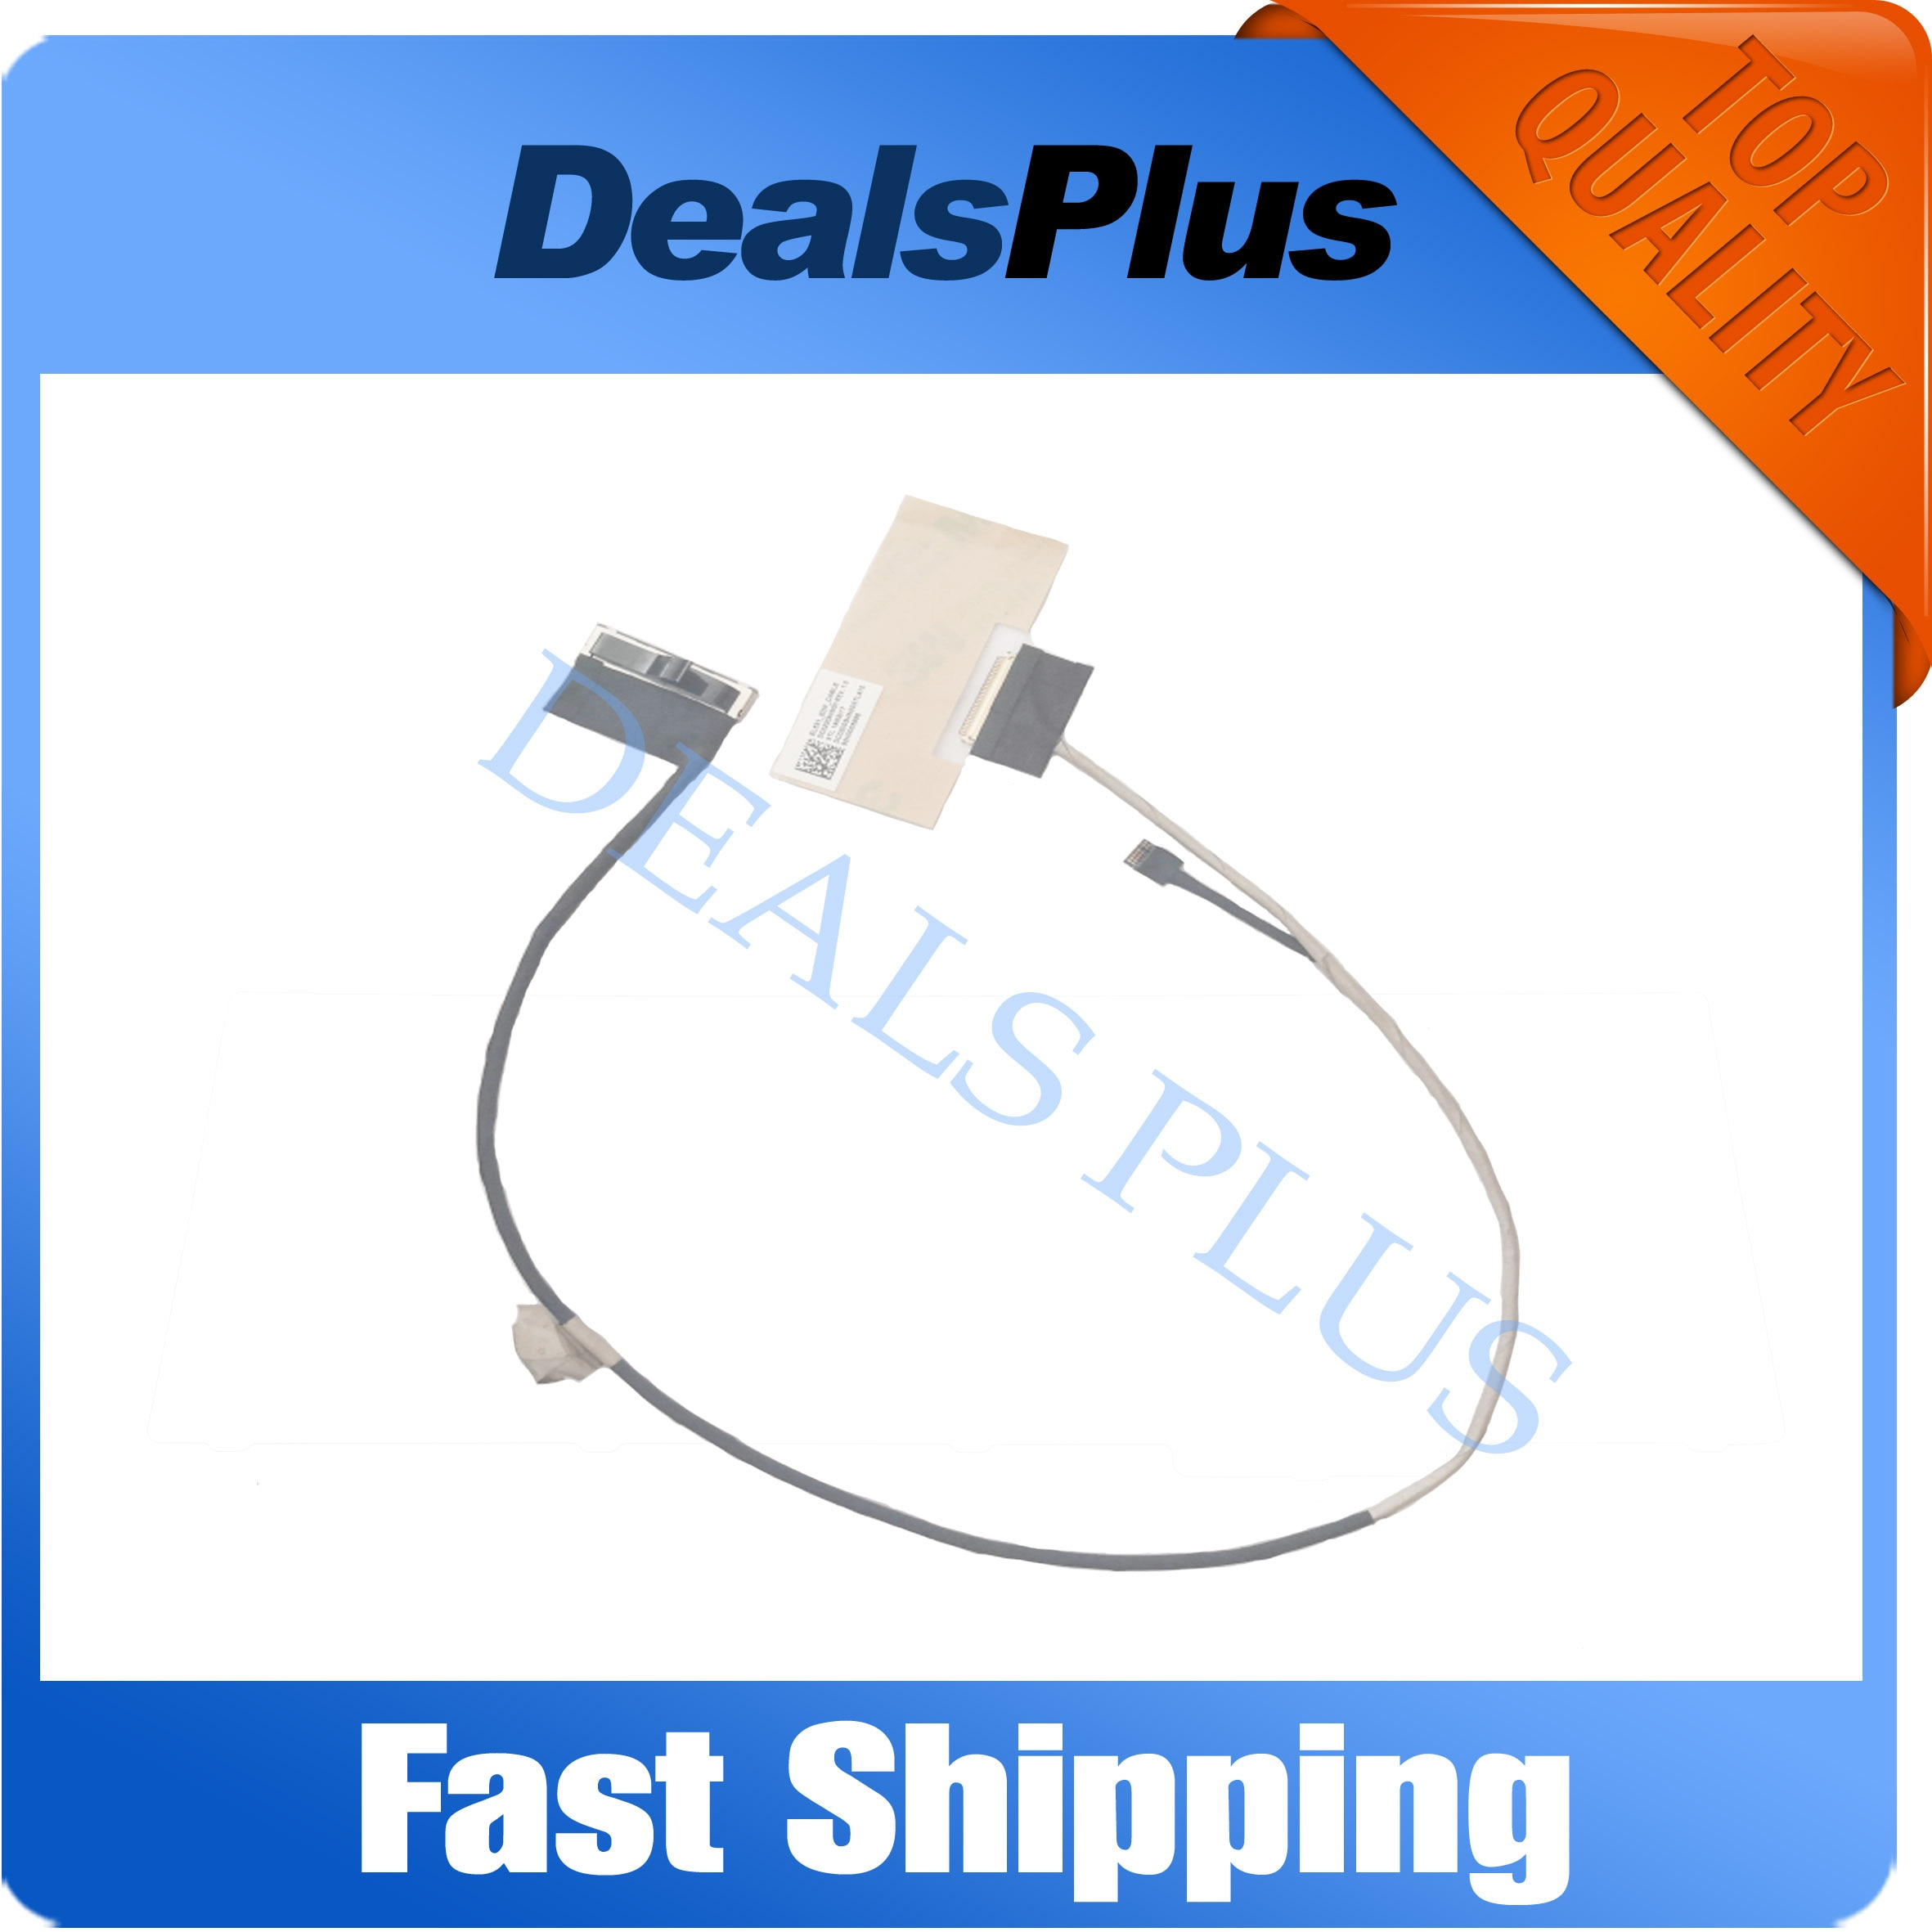 LCD LED LVDS Display Band Kabel DC02003HN00 Für Lenovo Ideapad S340-15 S340-15IWL S340-15API EL531 30pin